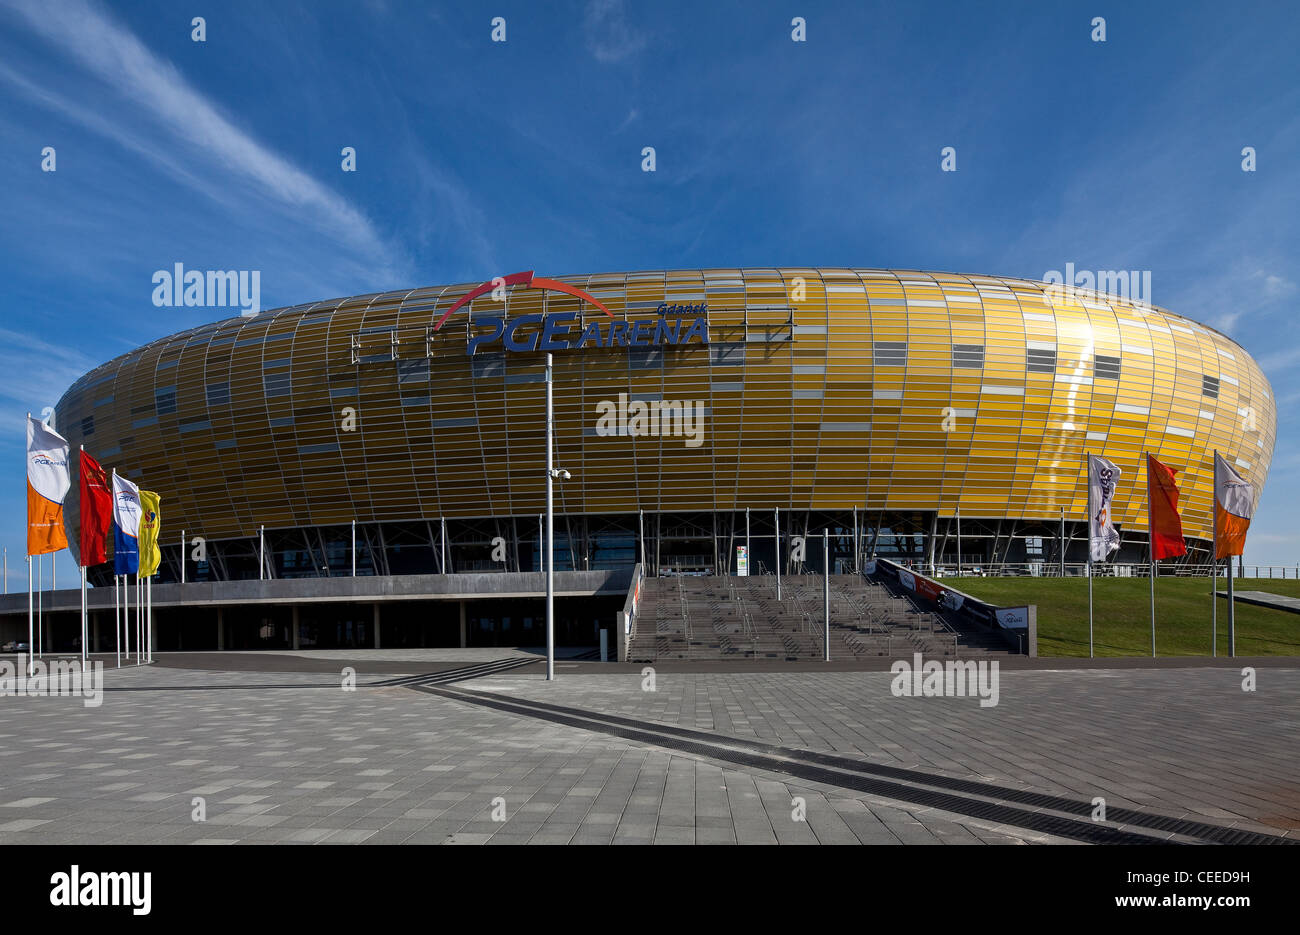 Danzig/Gdansk, PGE Arena - Stock Image